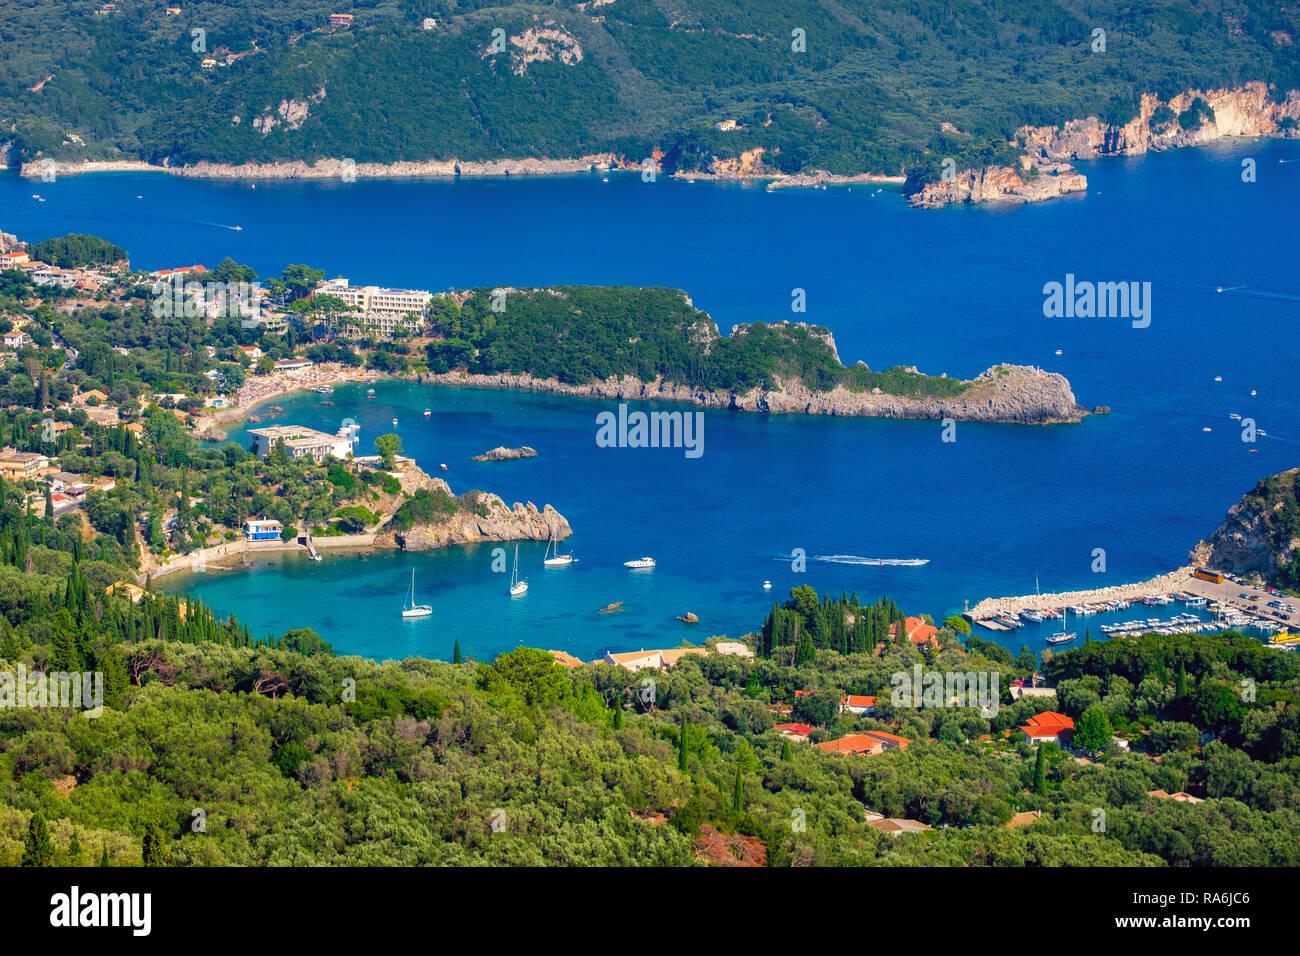 Beautiful island of Corfu, heart-shaped Paleokastritsa bay with charming and wonderful panoramic views in Greece ( Kerkyra) Stock Photo